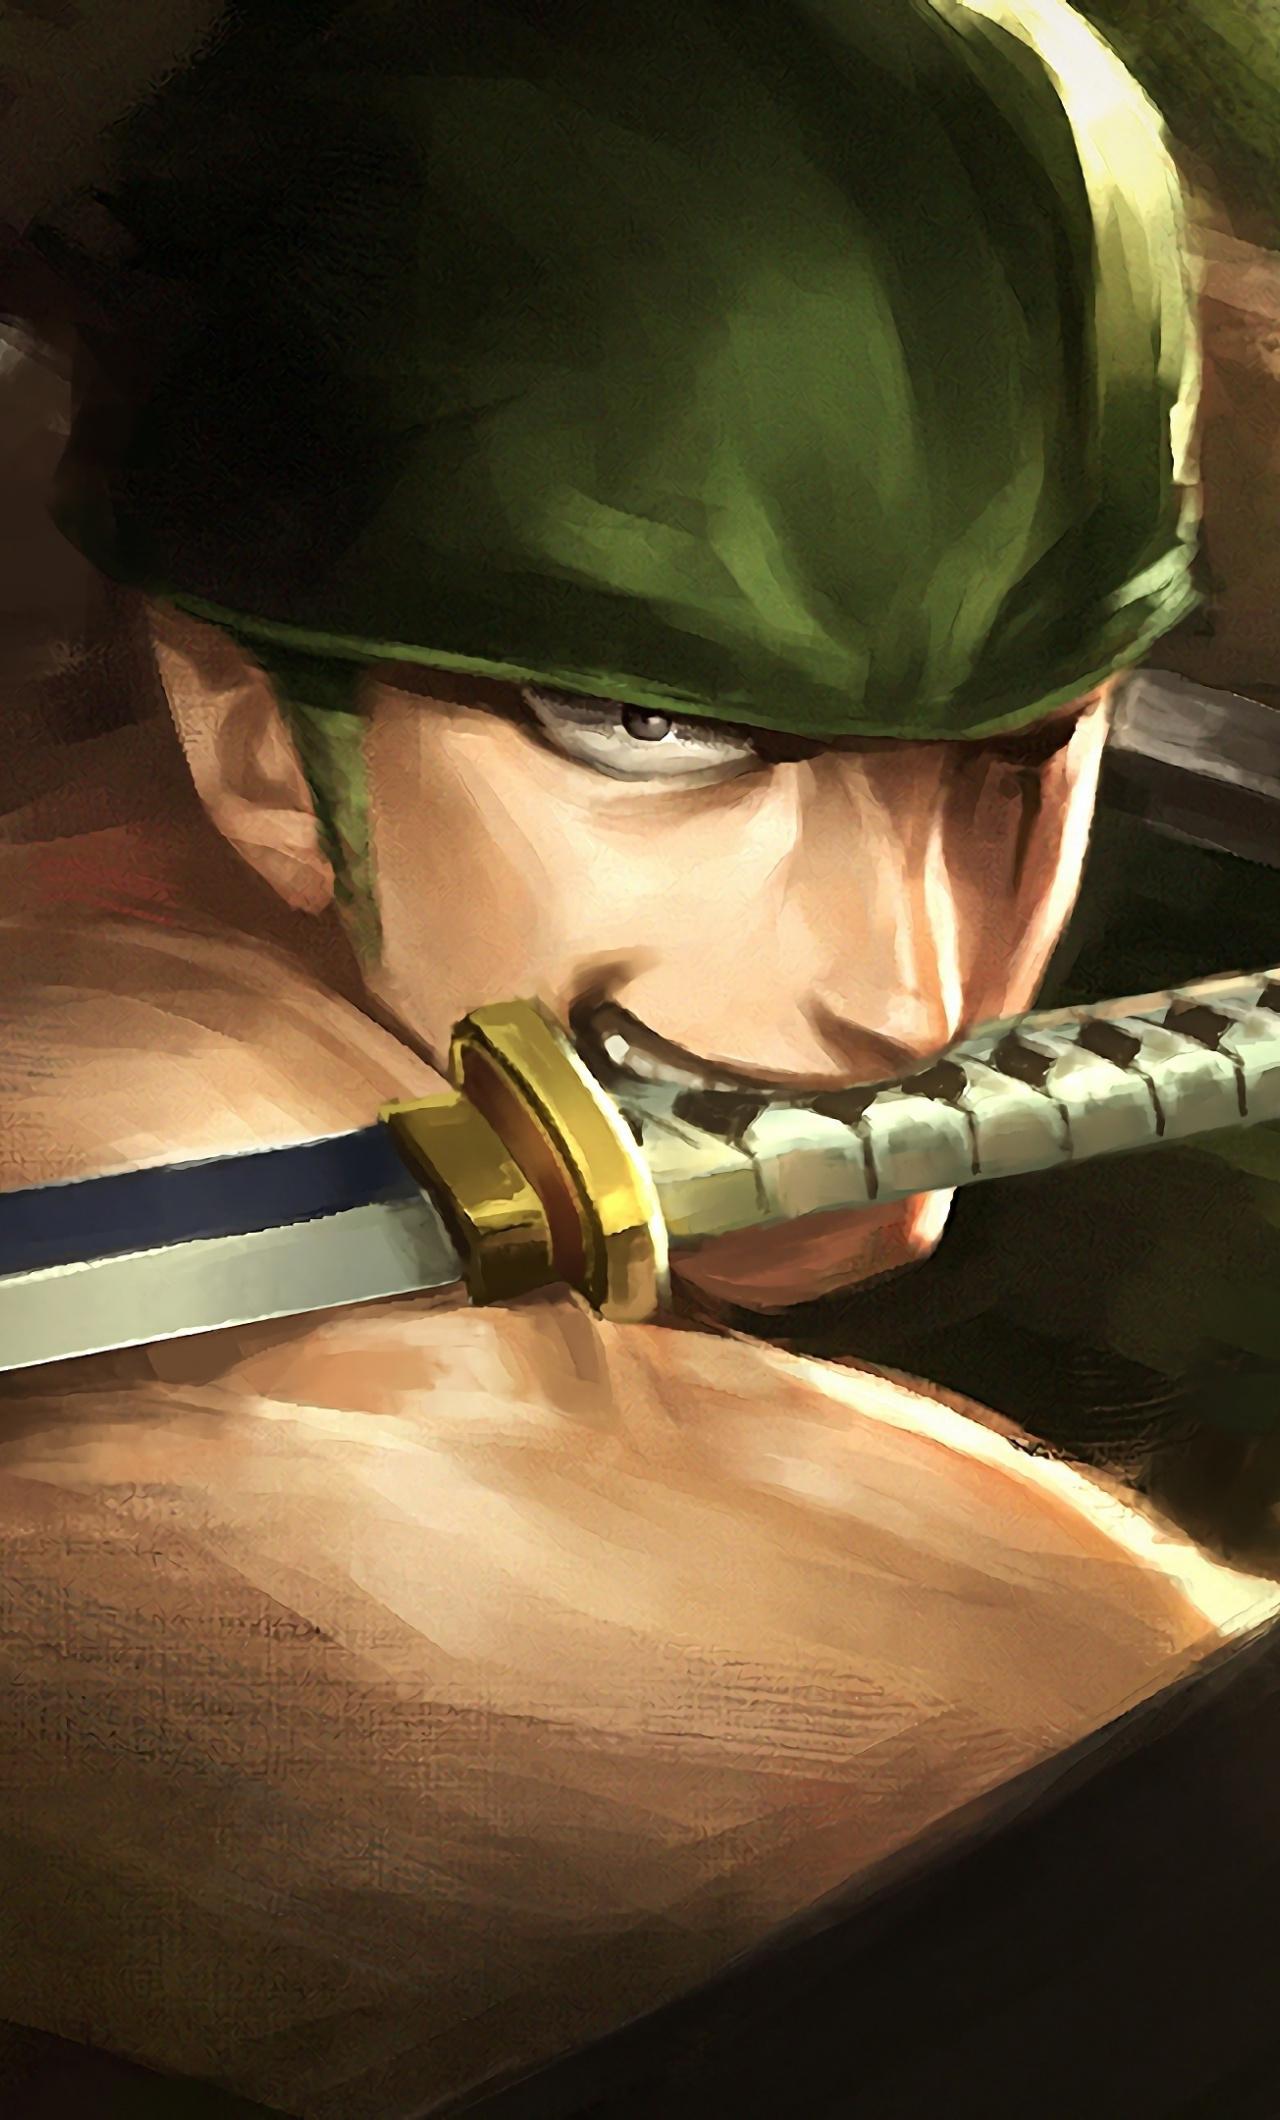 Artwork Warrior Roronoa Zoro One Piece Wallpaper Iphone One Piece Zoro 1280x2120 Wallpaper Teahub Io